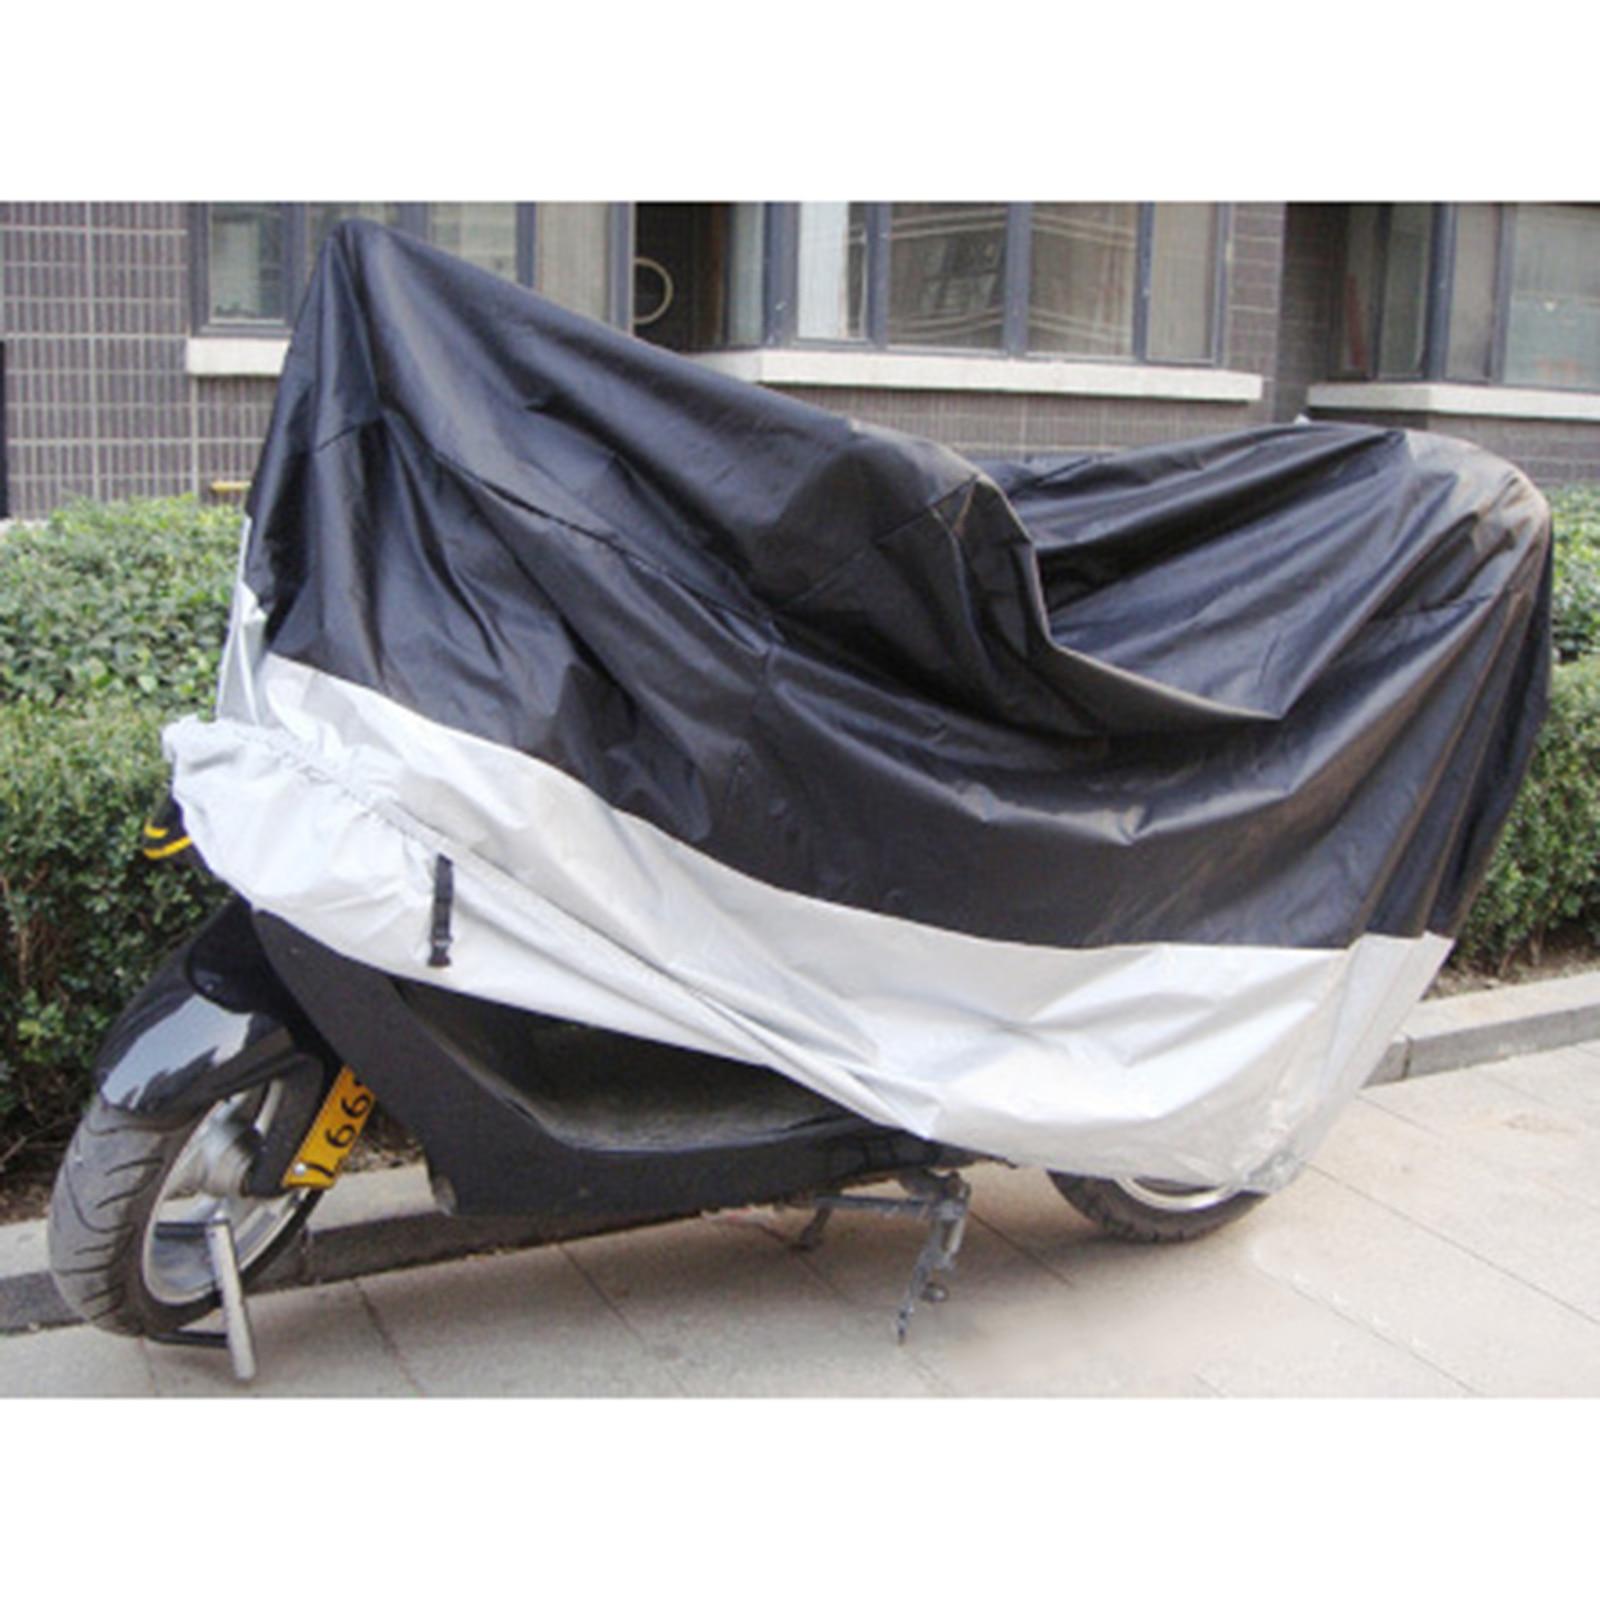 Big Size xxxl 265*105*125cm Motorcycle Covering Wa.